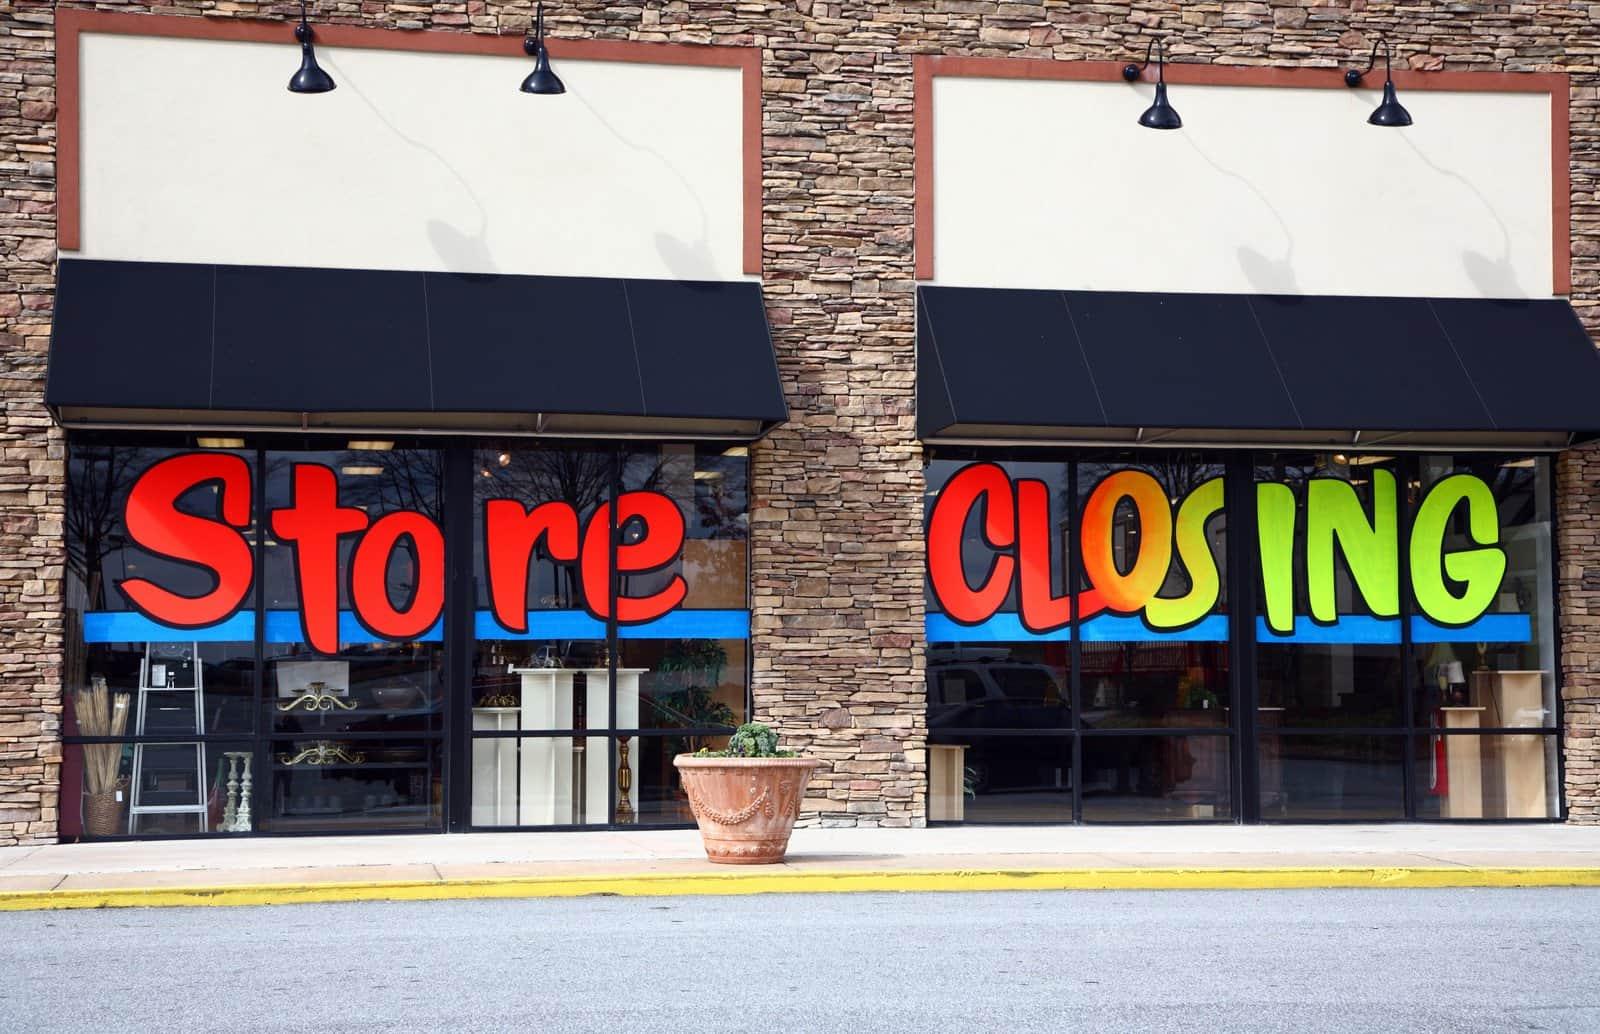 Marijuana dispensary closings due to crime rates